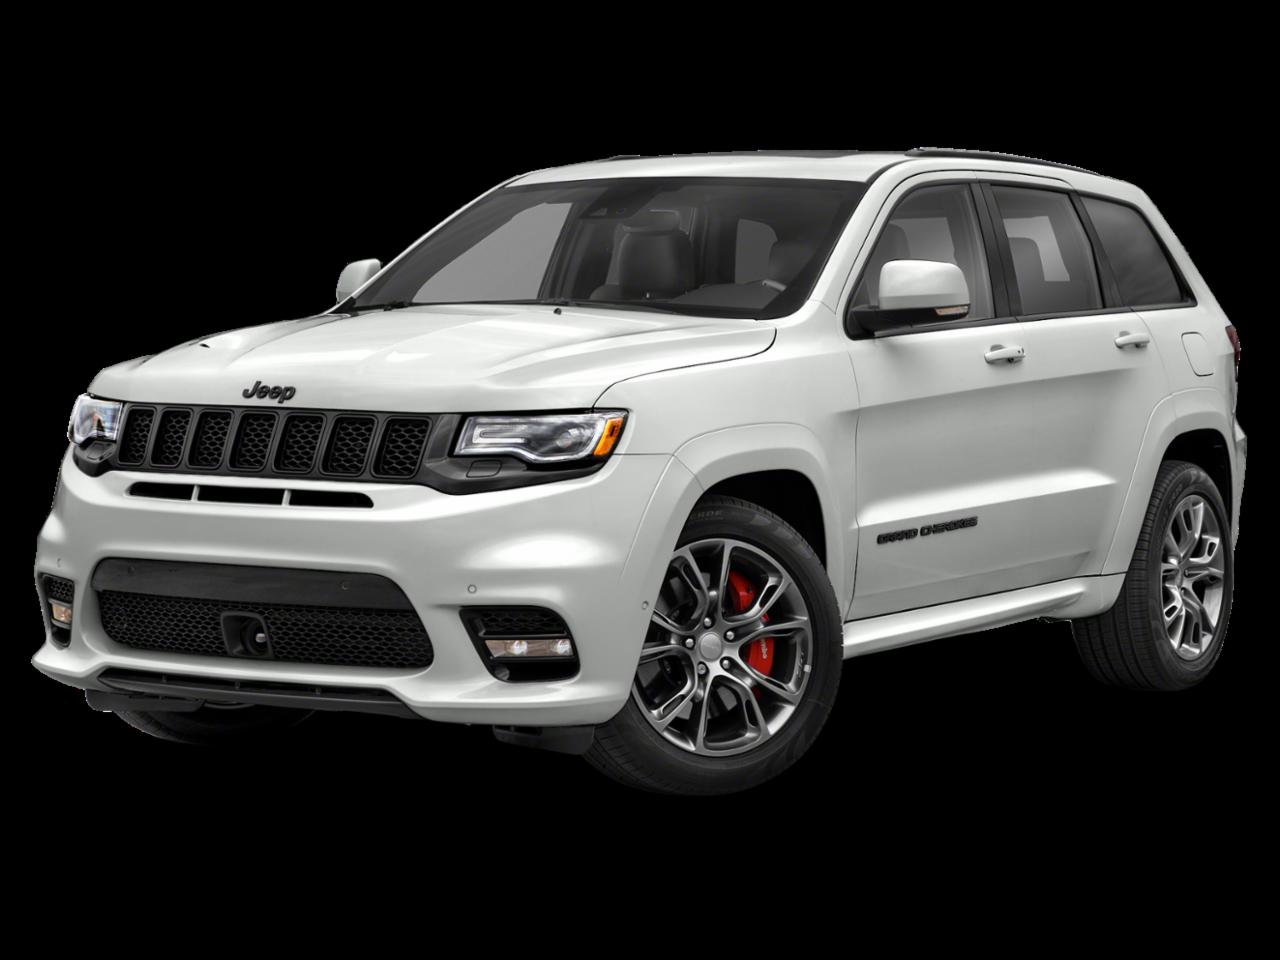 New 2020 Jeep Grand Cherokee SRT